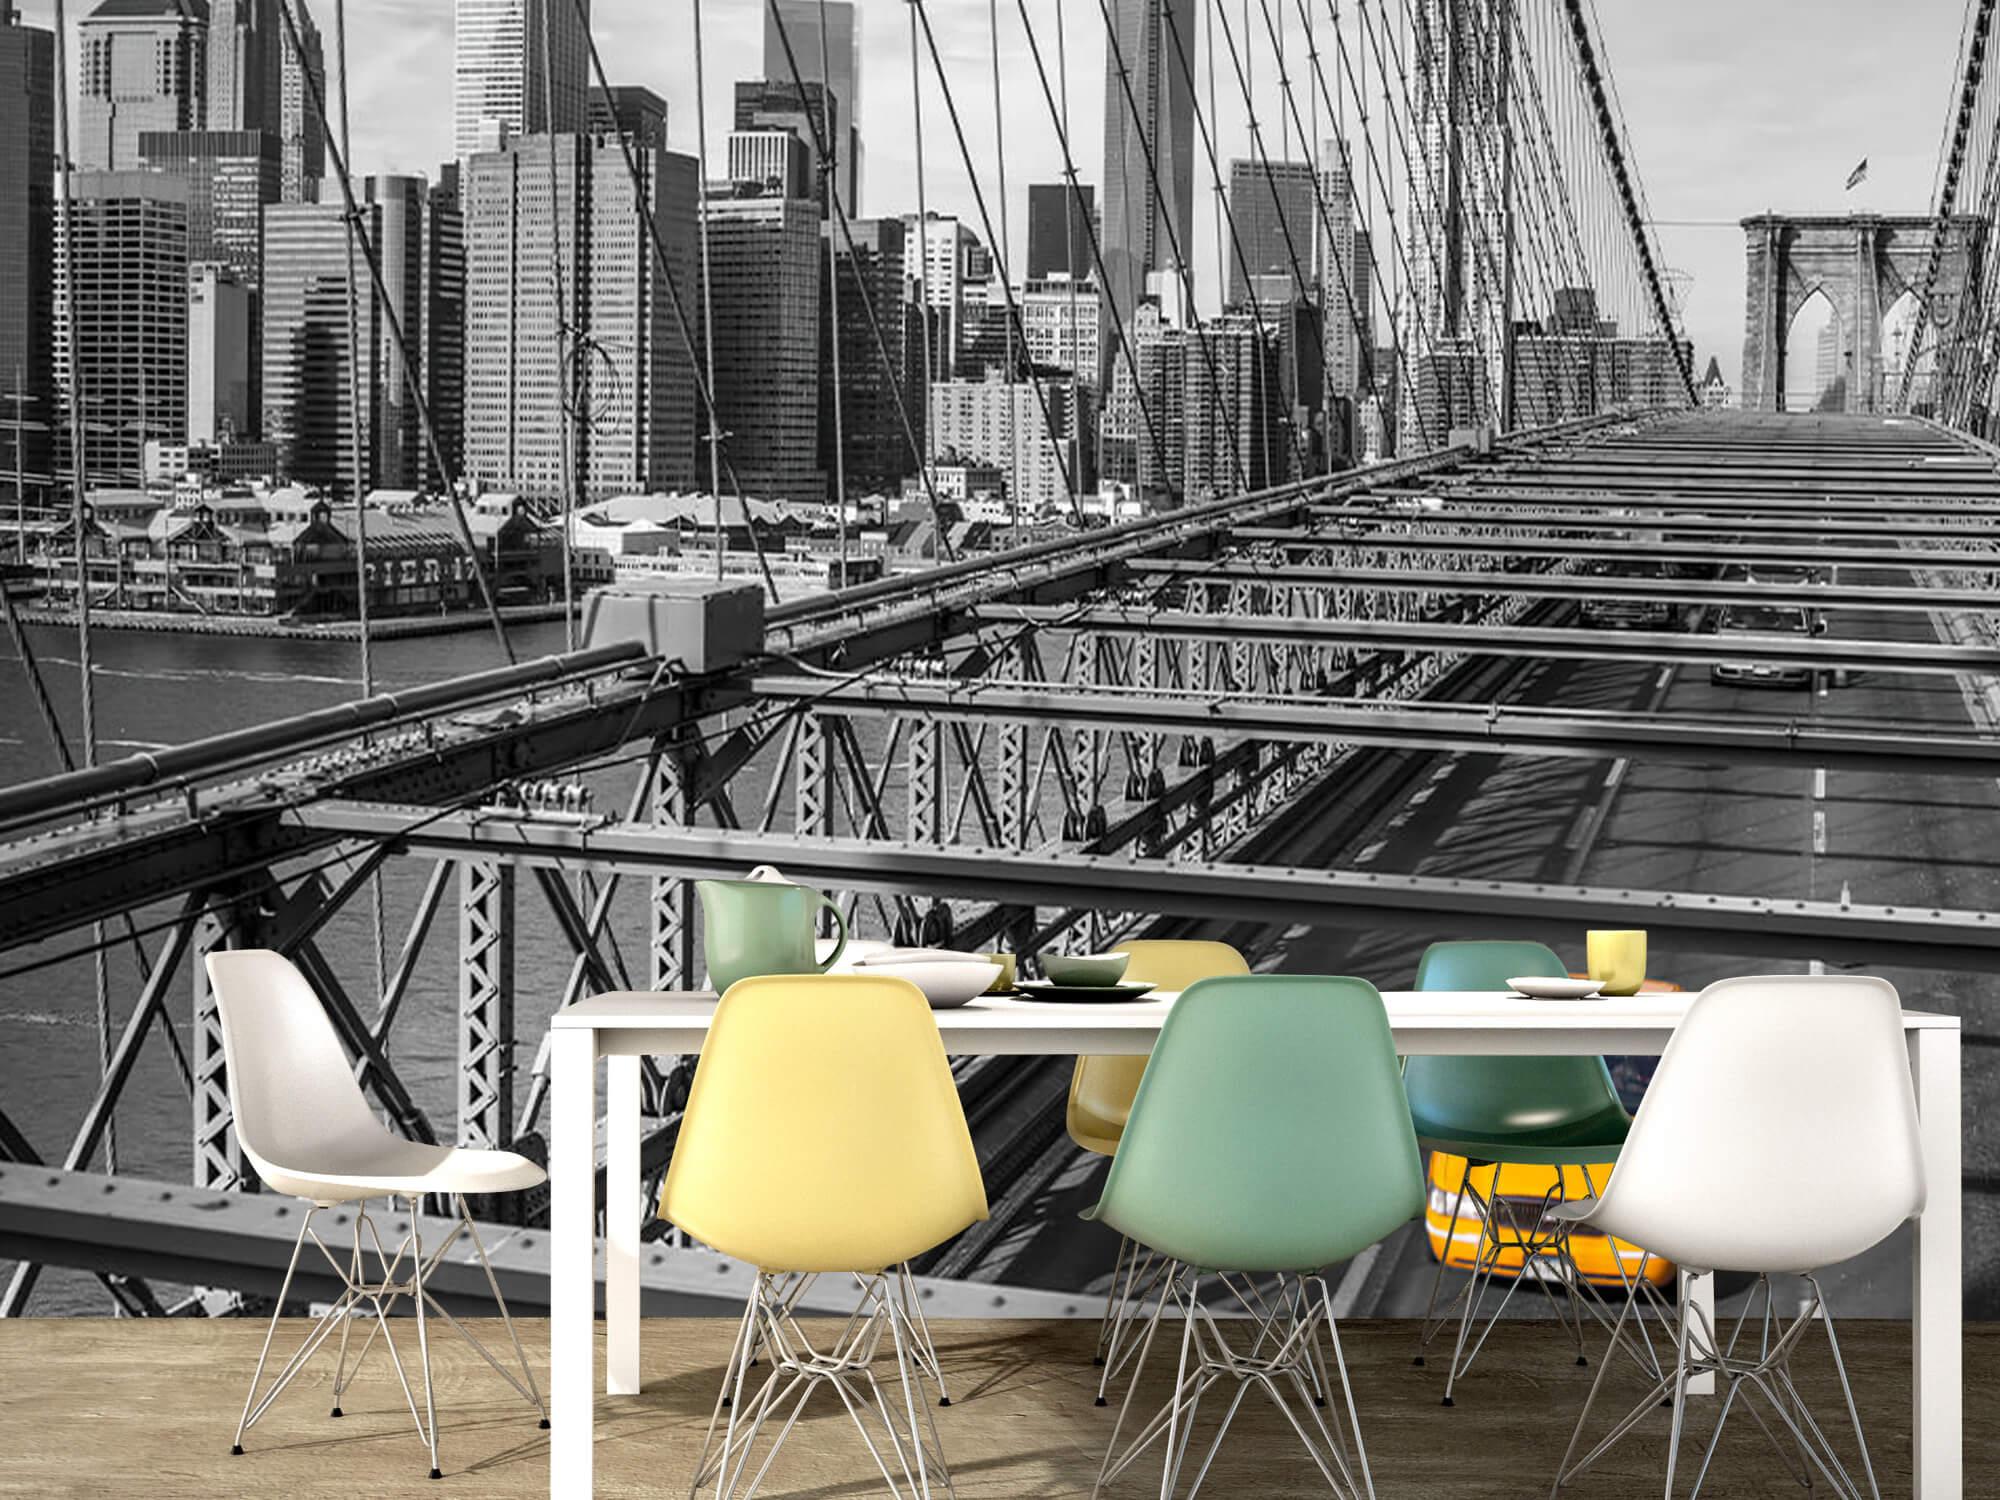 A taxi across the Brooklyn Bridge 14